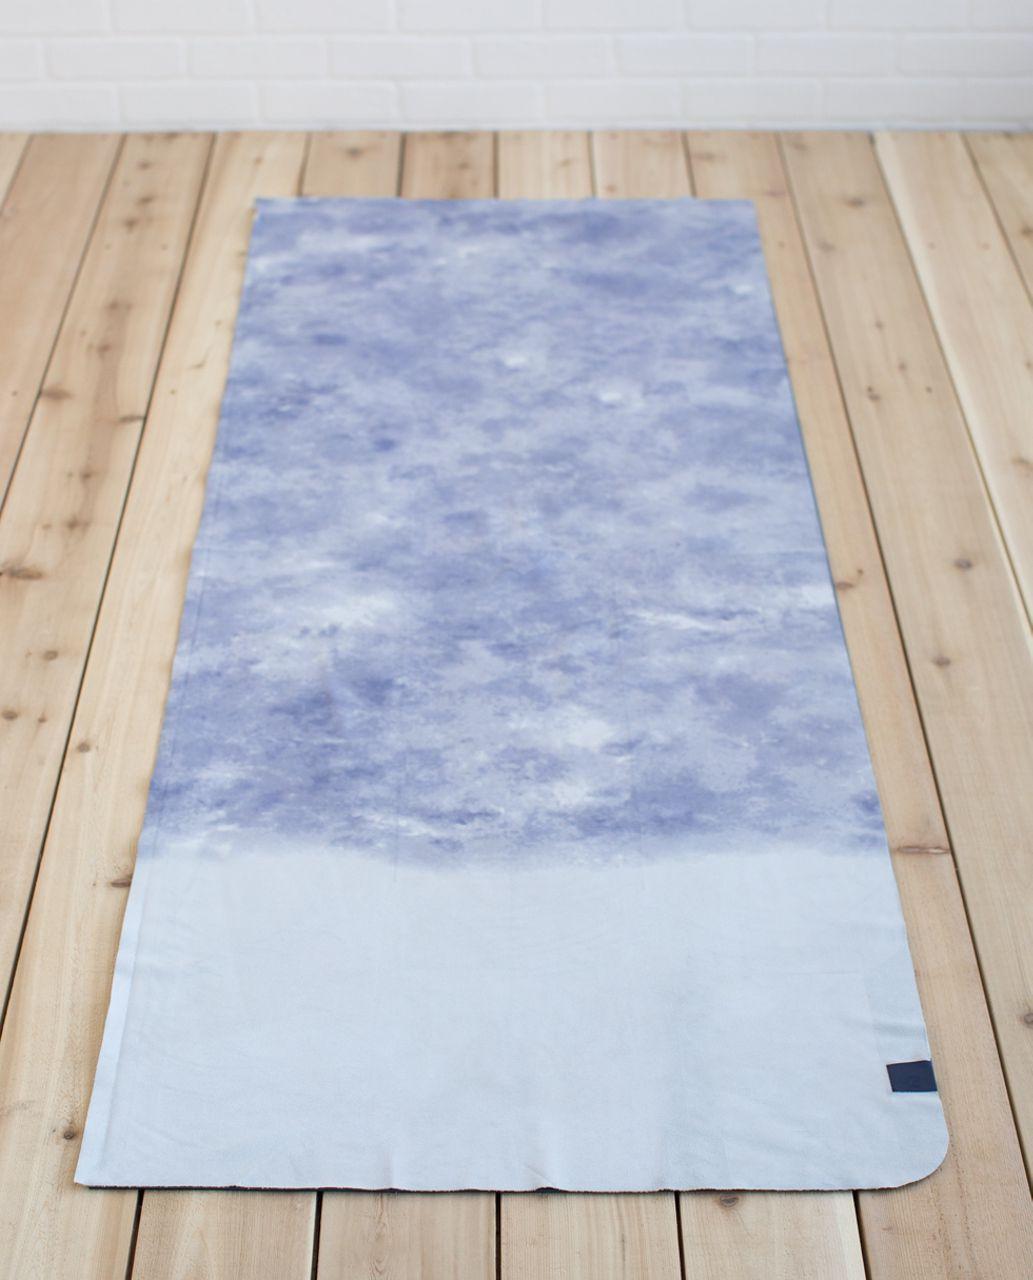 Lululemon The Towel - Dipped Desert Silver Spoon Deep Navy